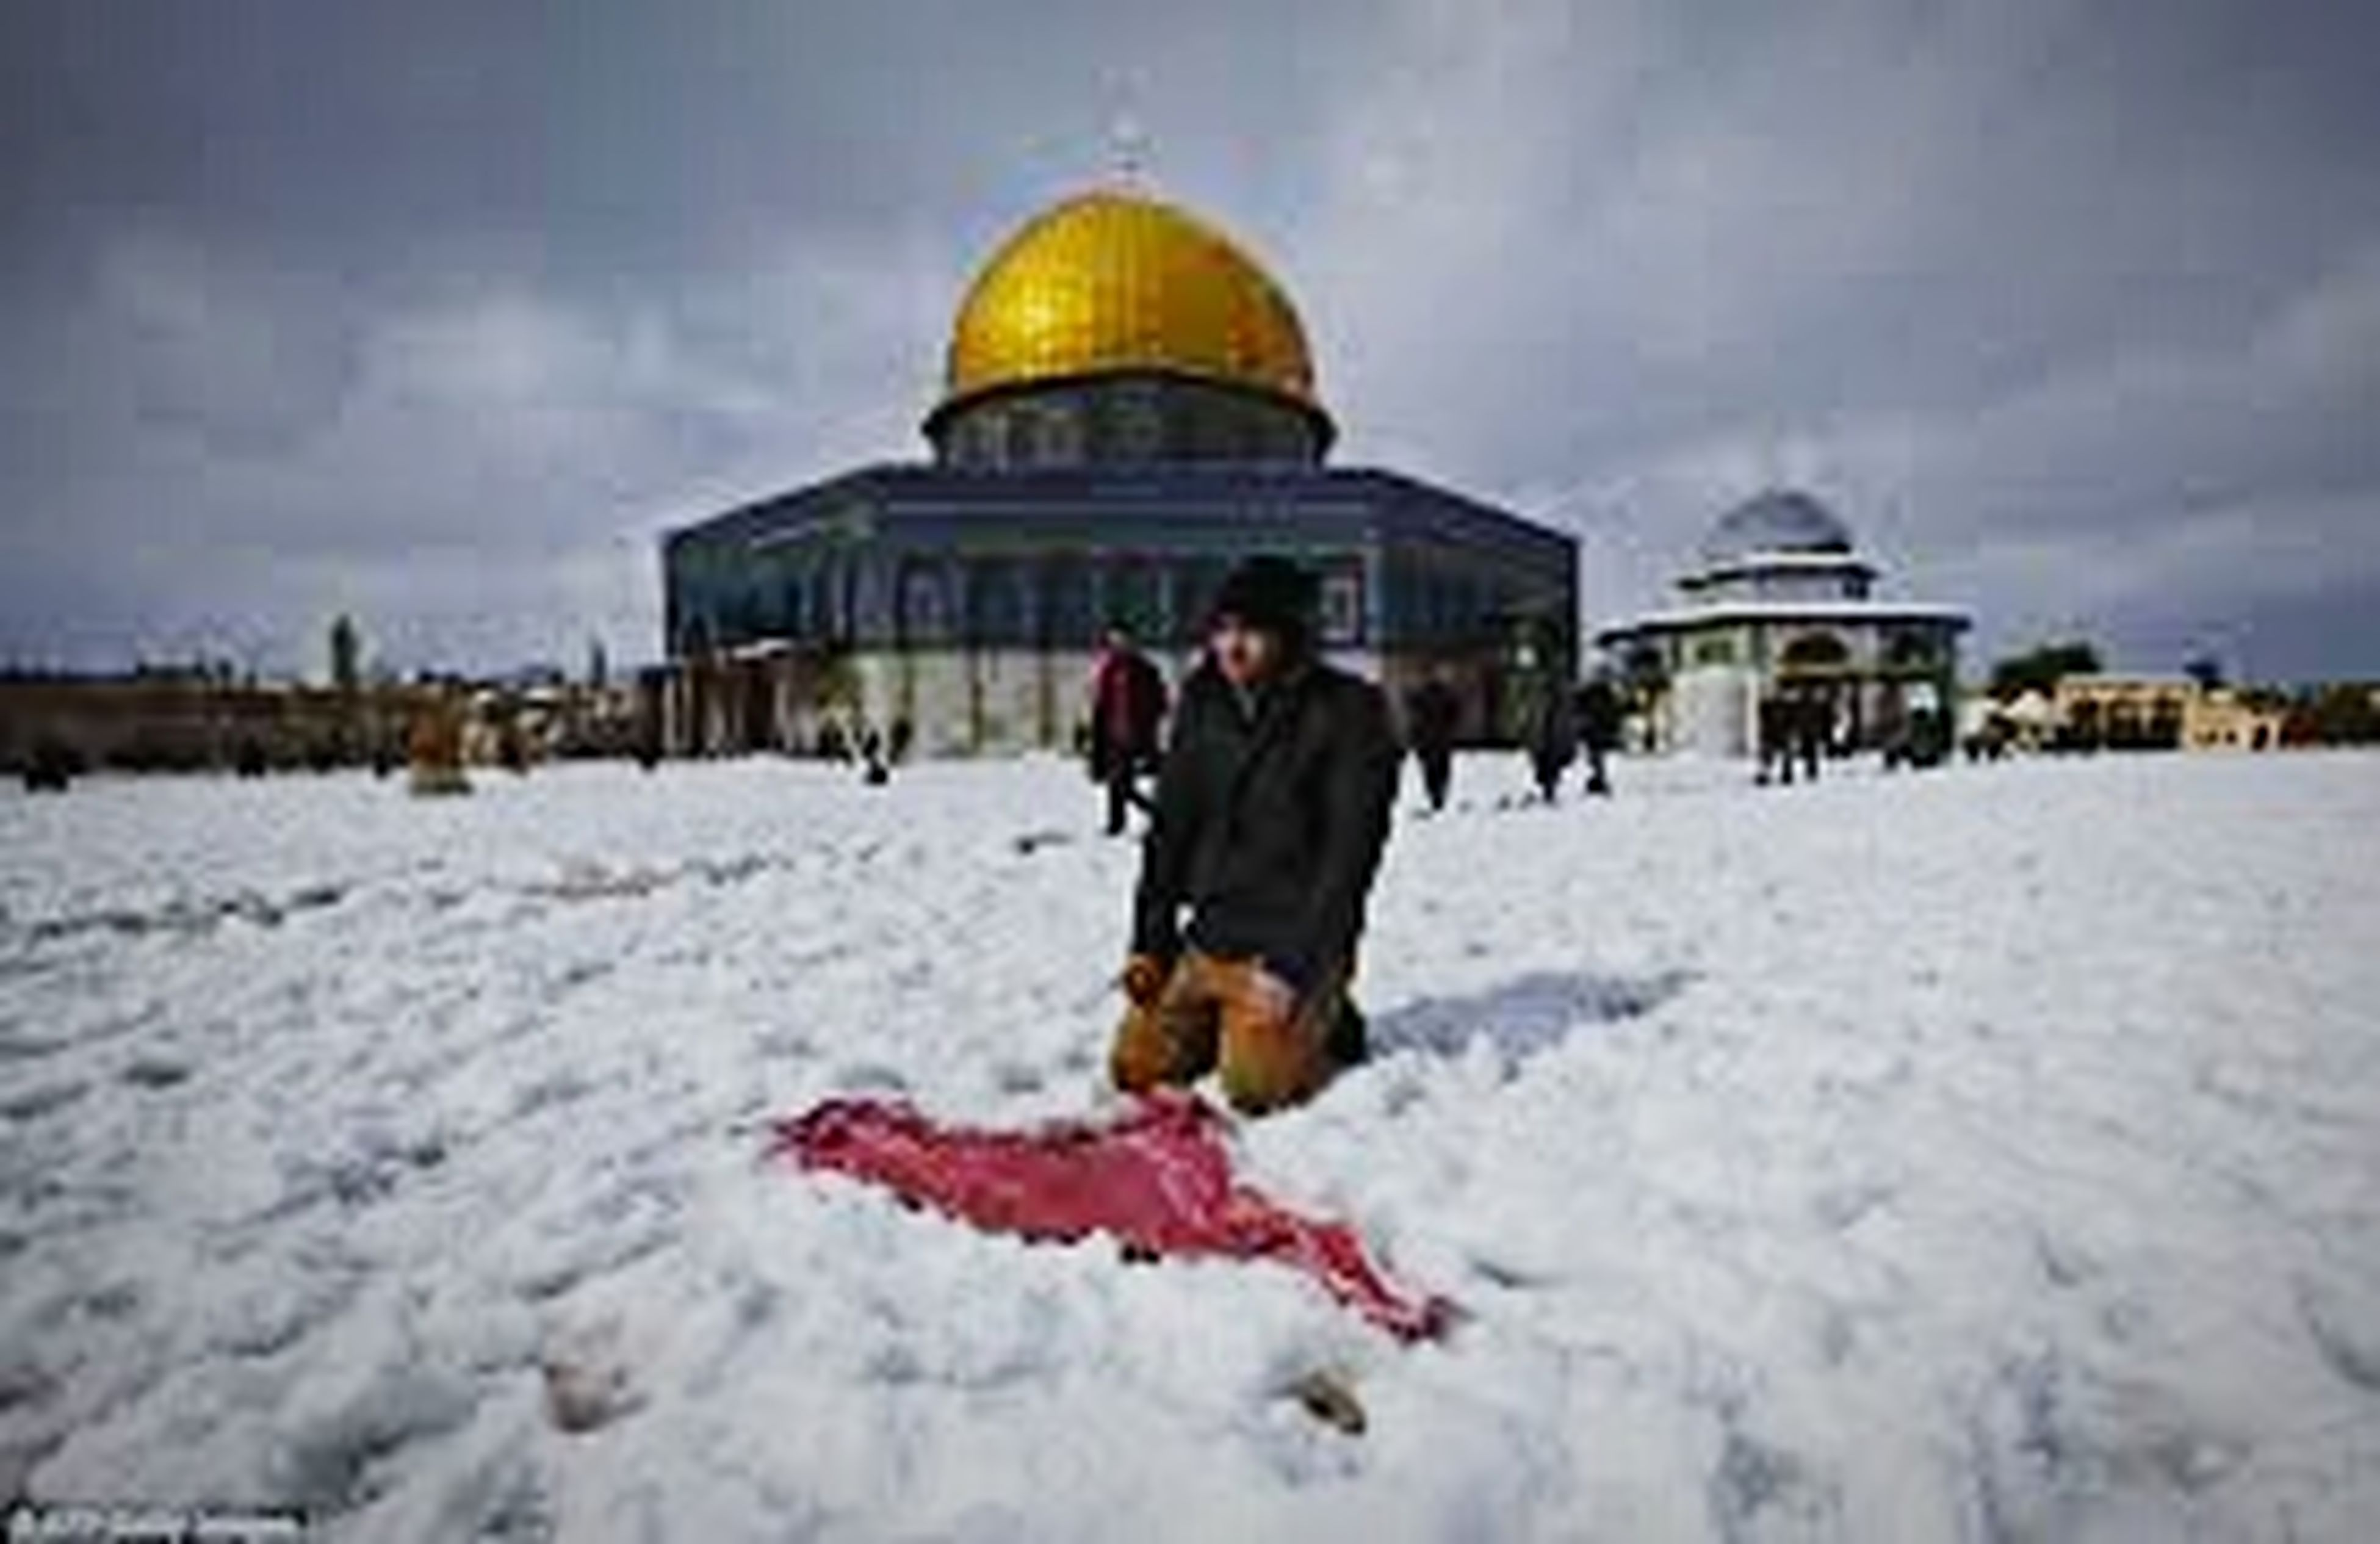 Palestine Will Rise Again. Palestine Will One Day Be Free♡ Palestinian Palestina My Love الاقصى شرف المسلمين غزة_تنتصر فلسطين_تقاوم الاقصى في حرية